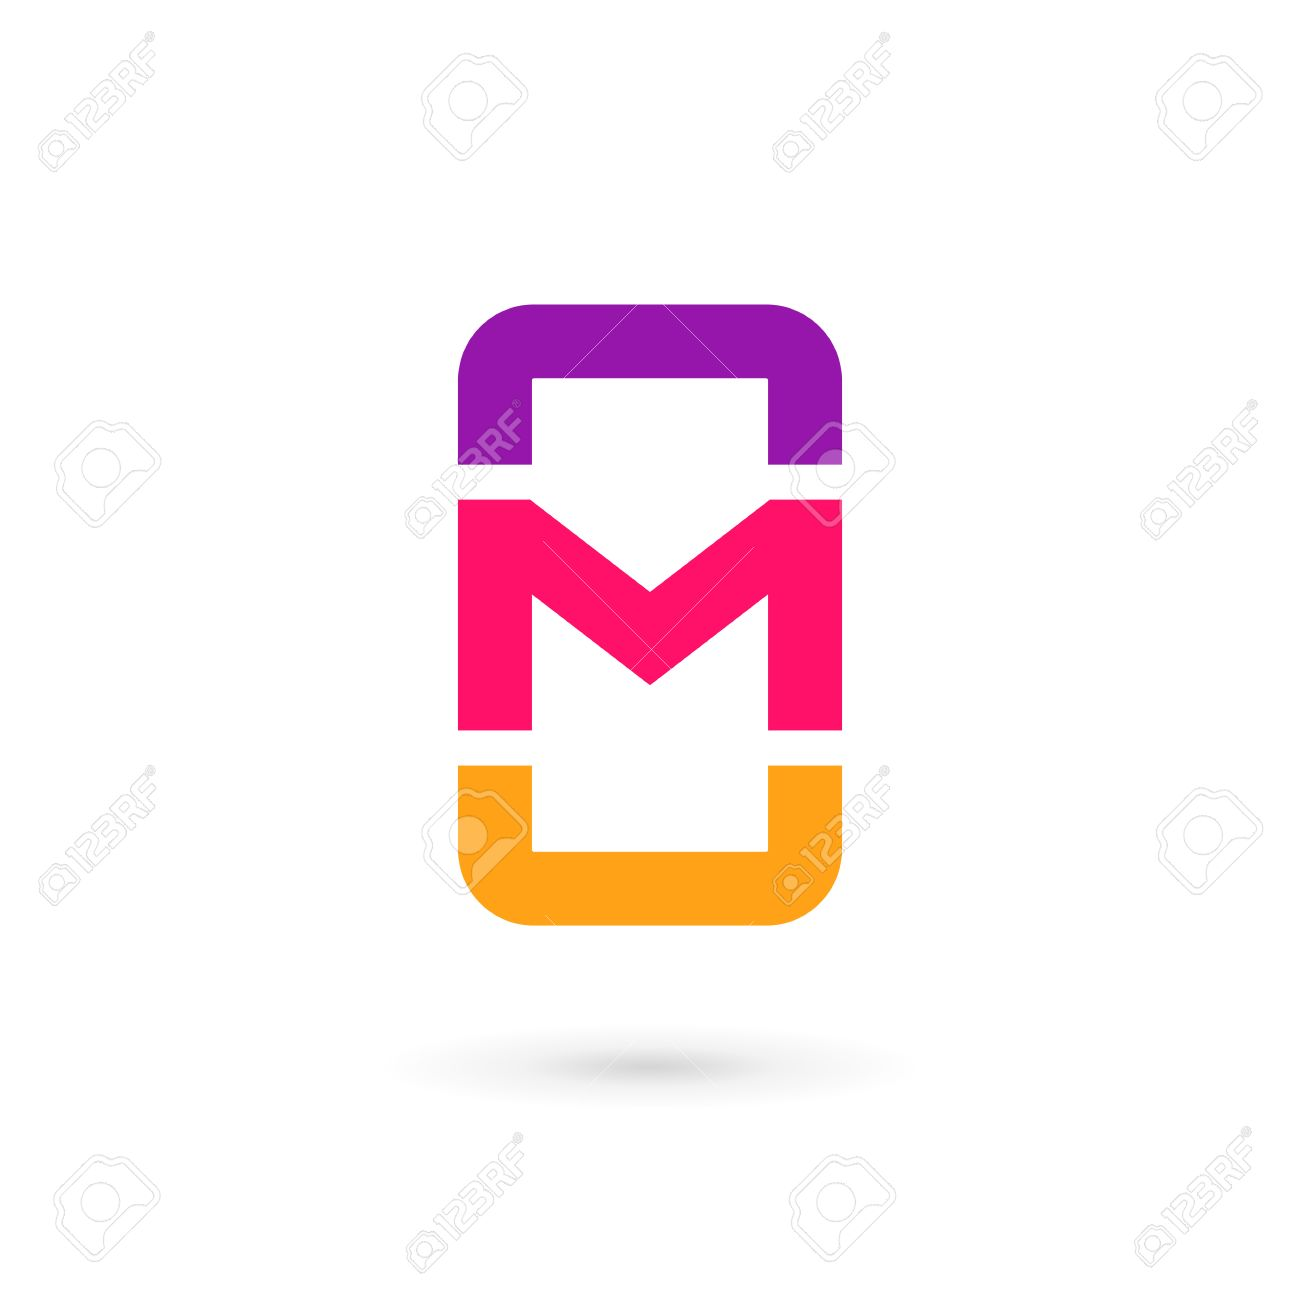 Design your logo app